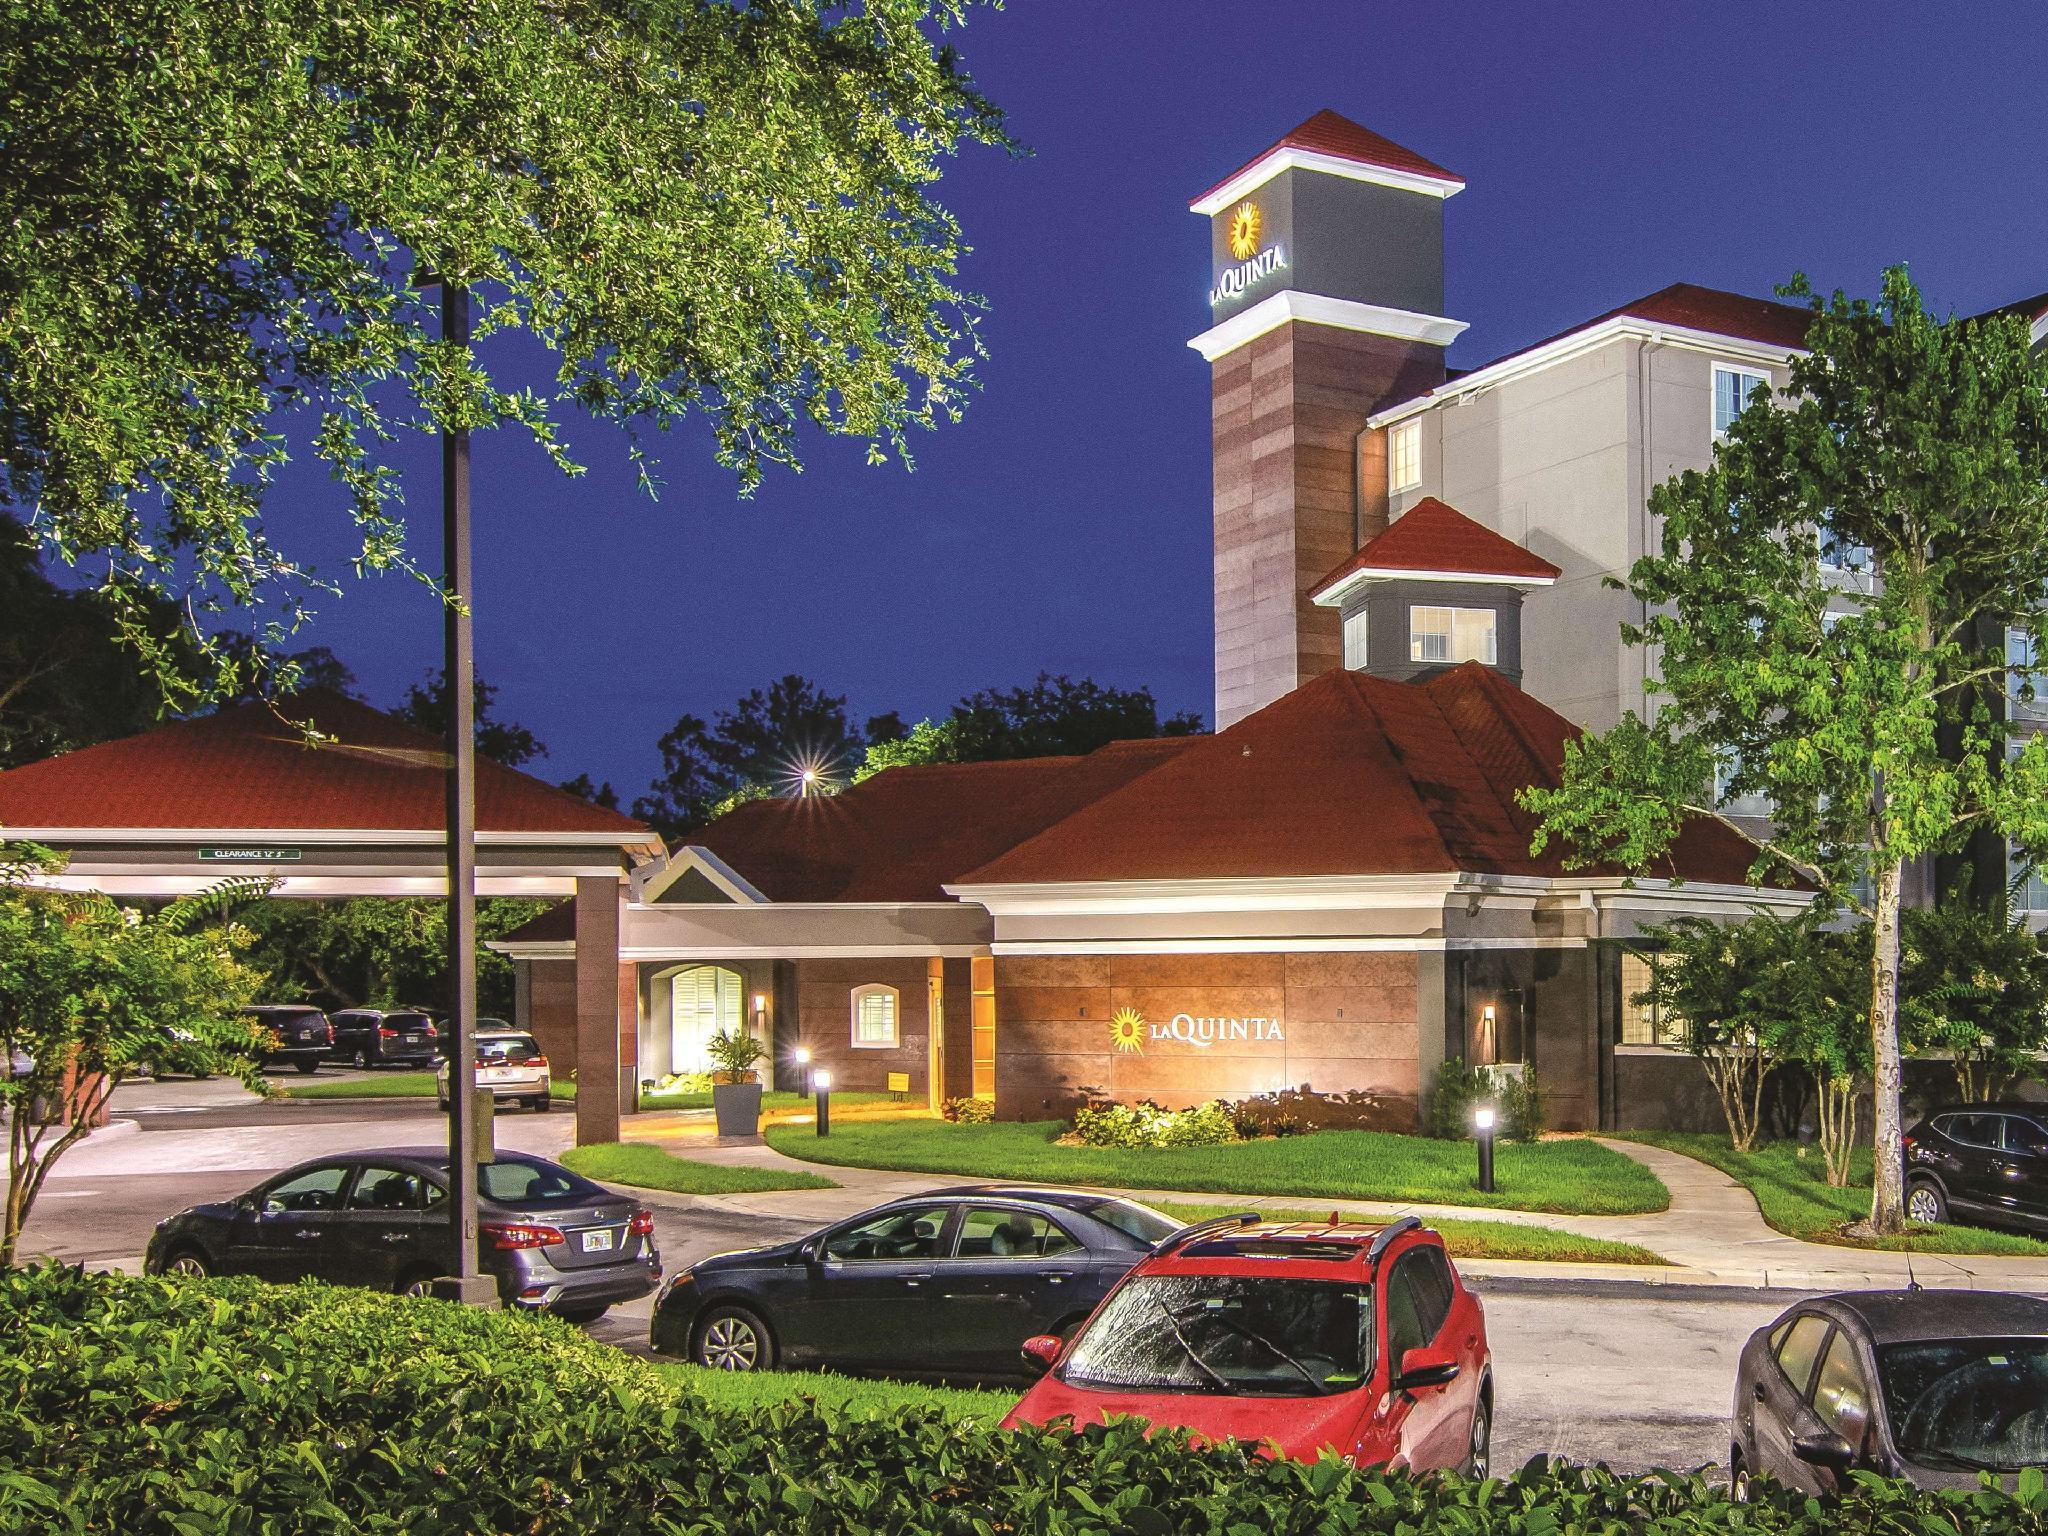 La Quinta Inn And Suites By Wyndham Orlando UCF